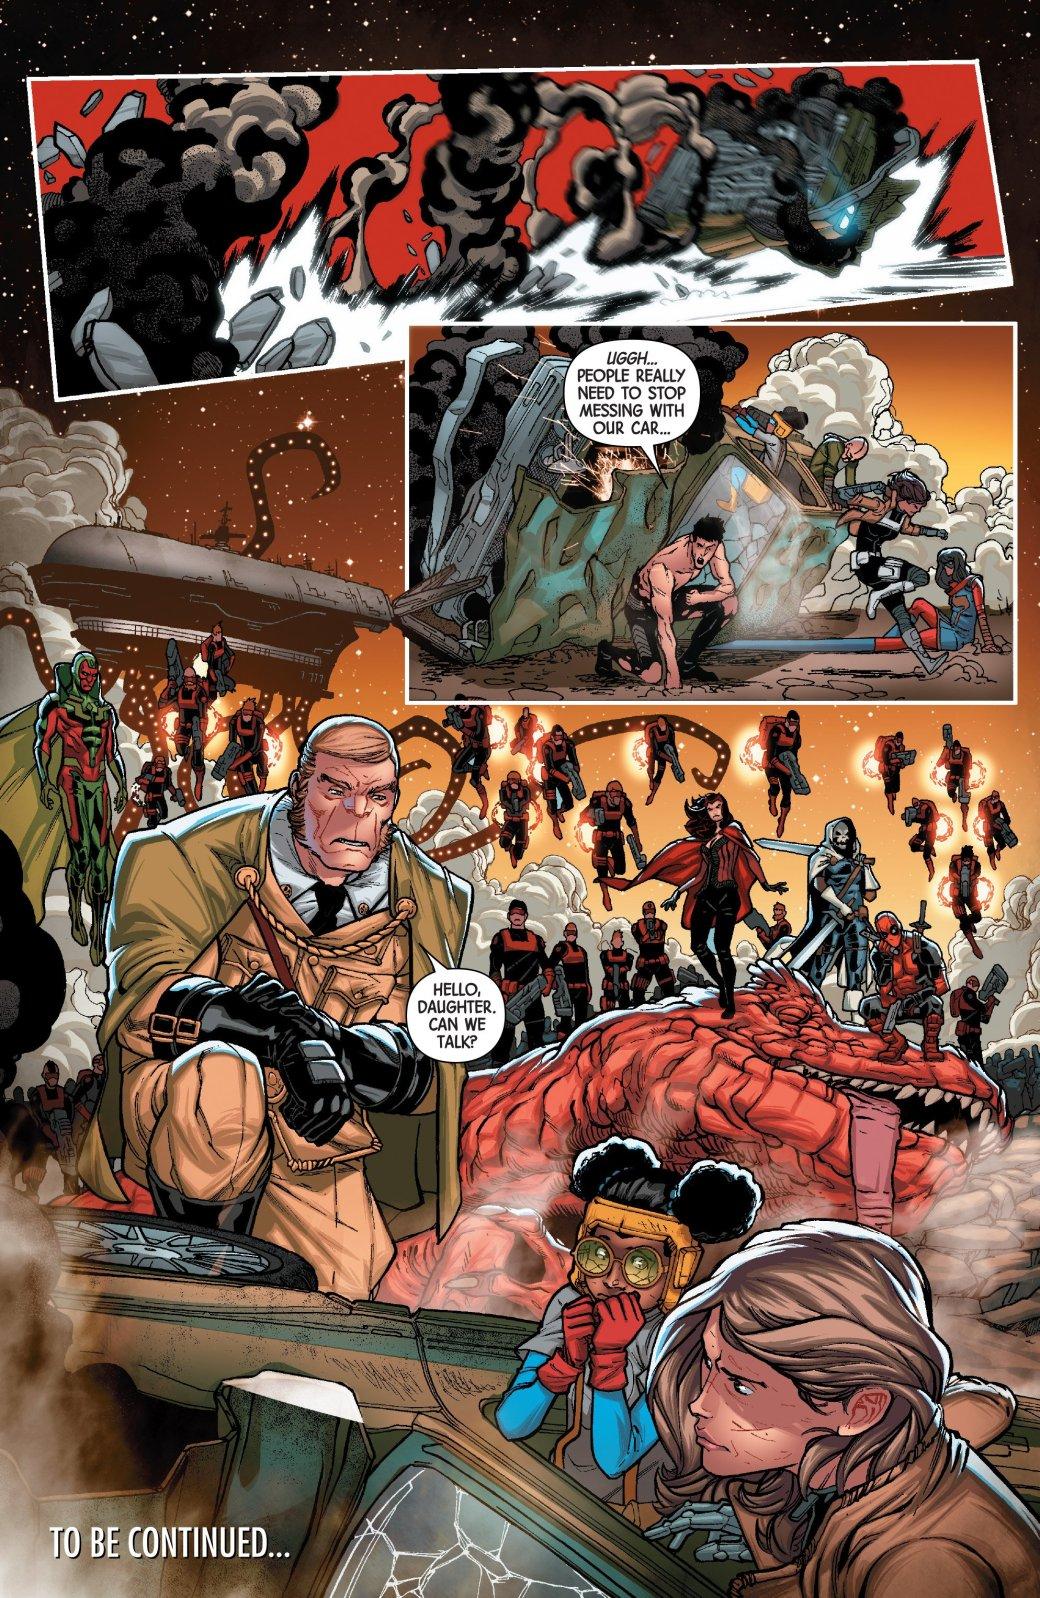 Secret Empire: противостоянию Стива Роджерса иТони Старка нет конца - Изображение 12